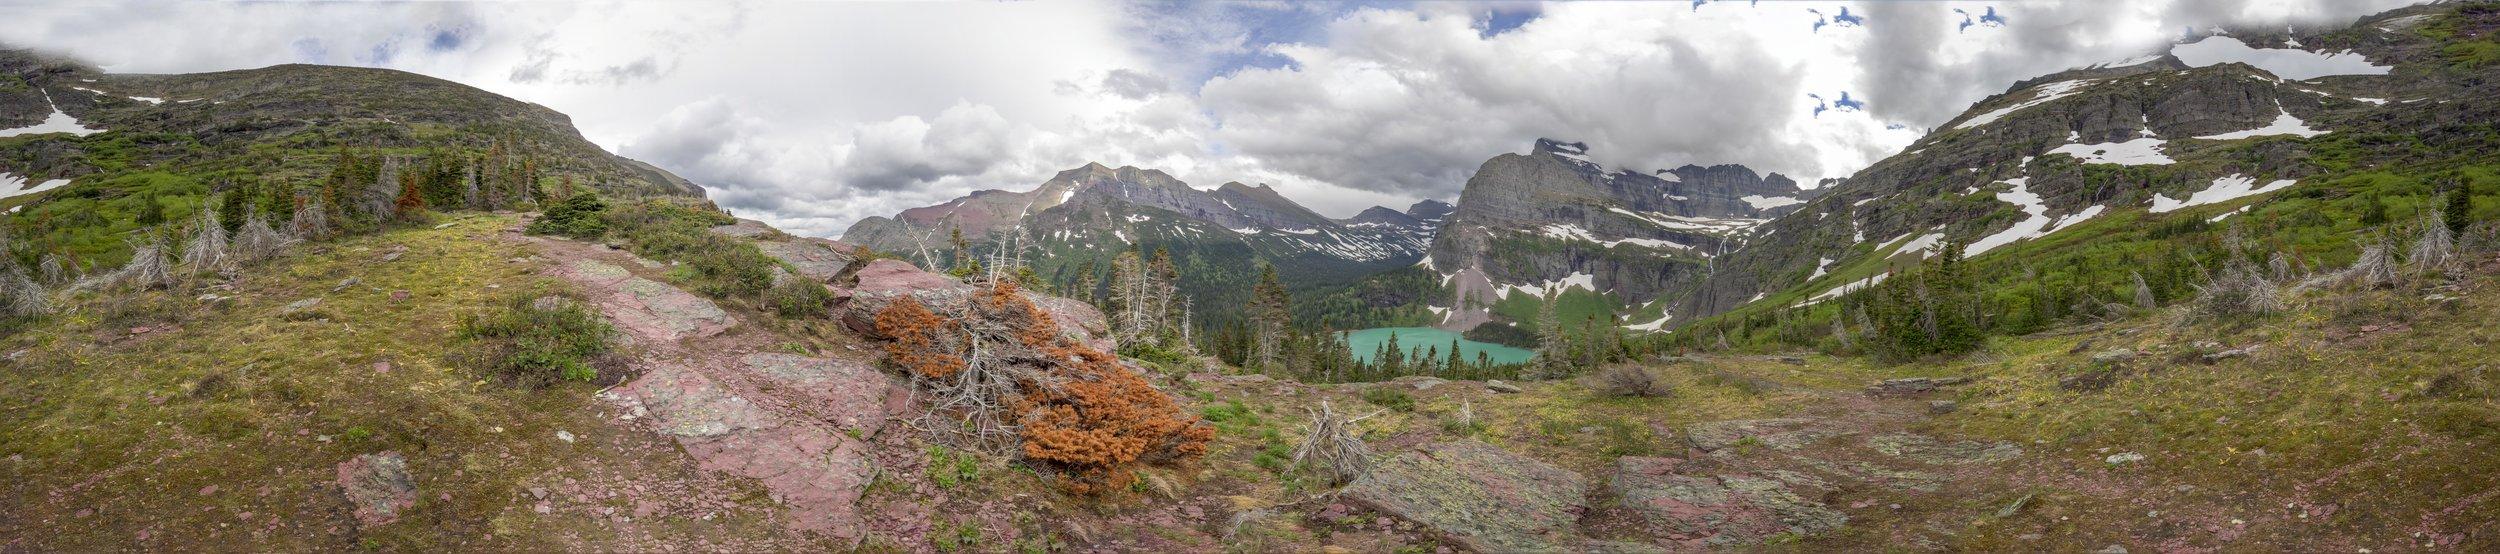 GlacierNational Park - Montana | USA